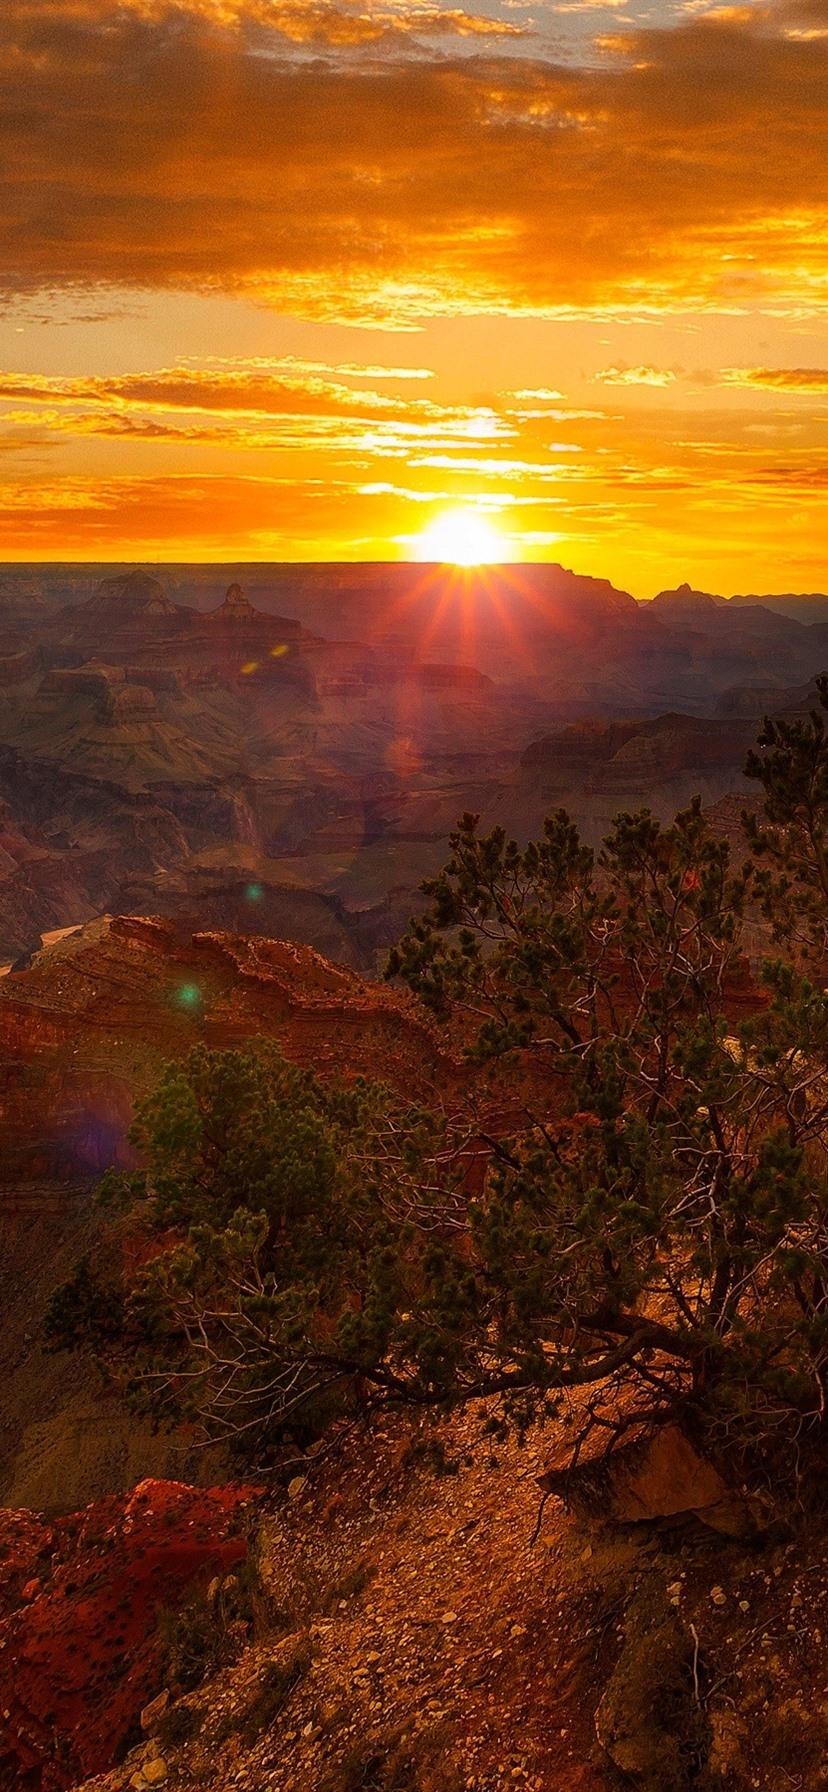 Usa Canyon Rocks Clouds Sunset 828x1792 Iphone Xr